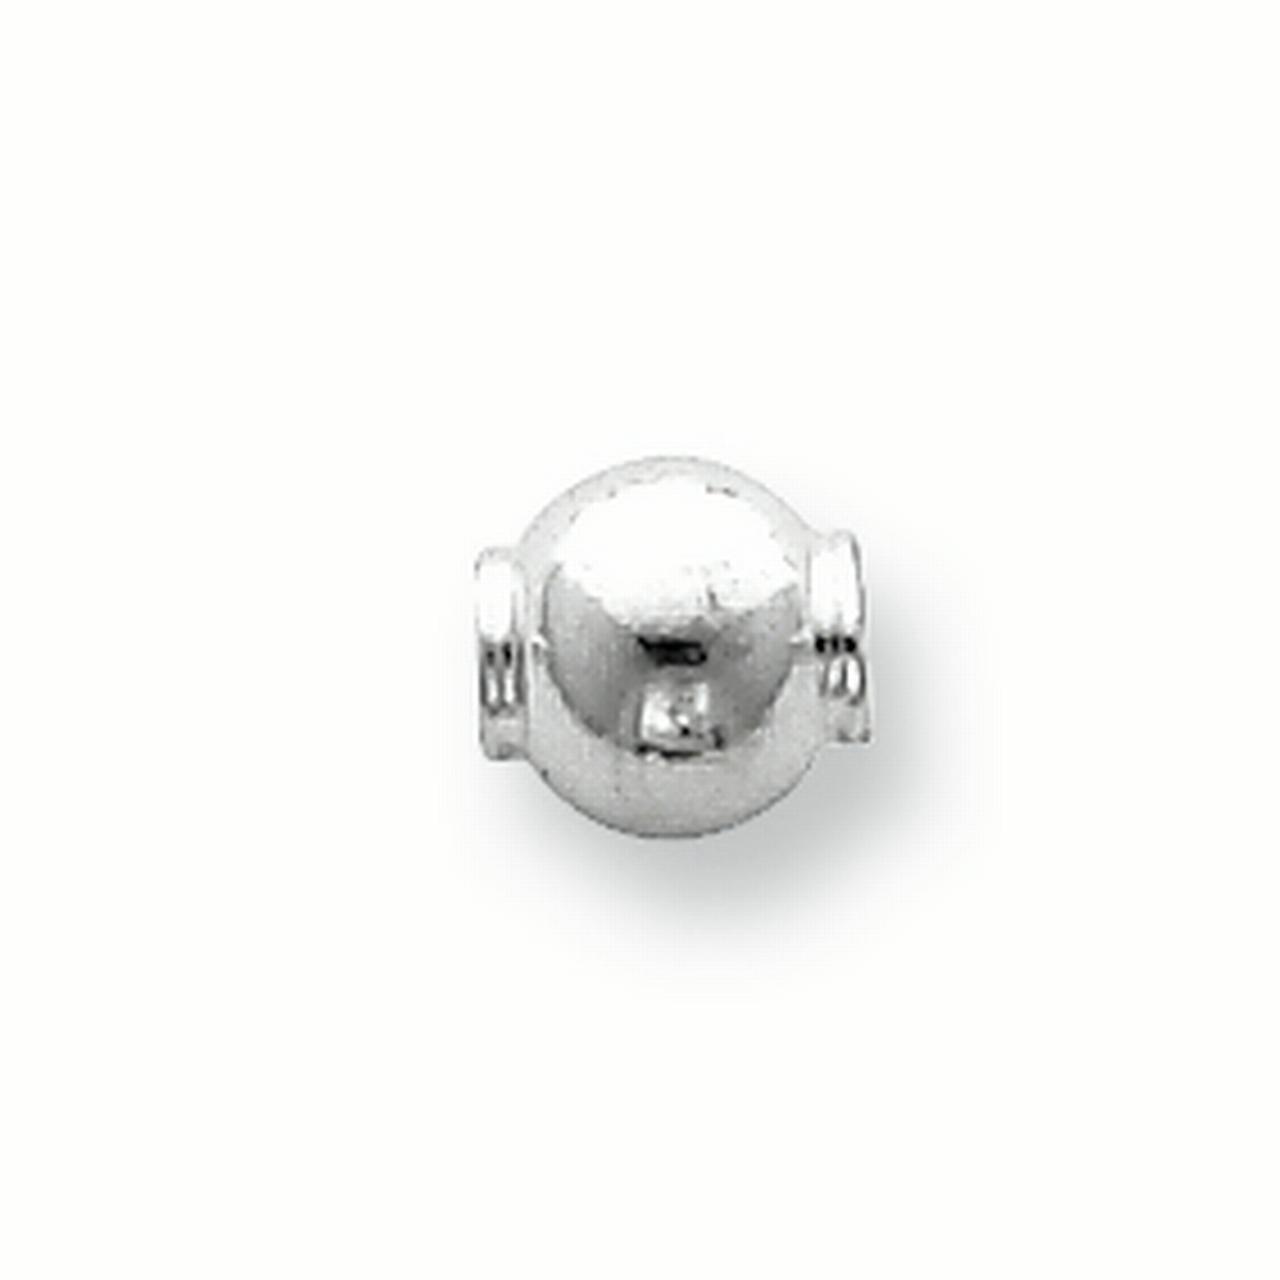 Sterling Silver 6.2 x 6.0mm Polished Fancy Bead